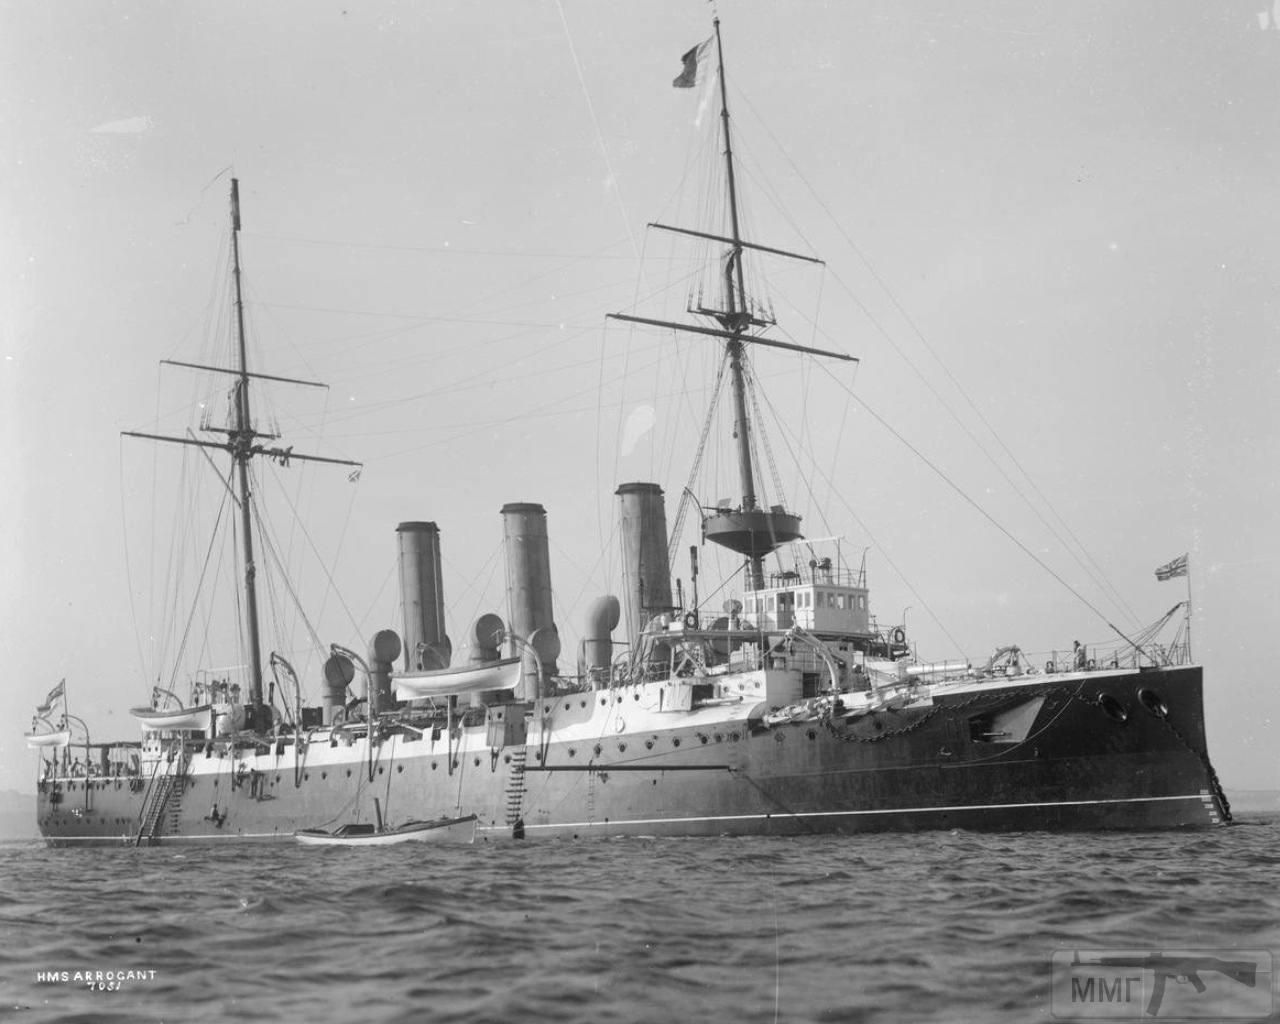 56557 - HMS Arrogant